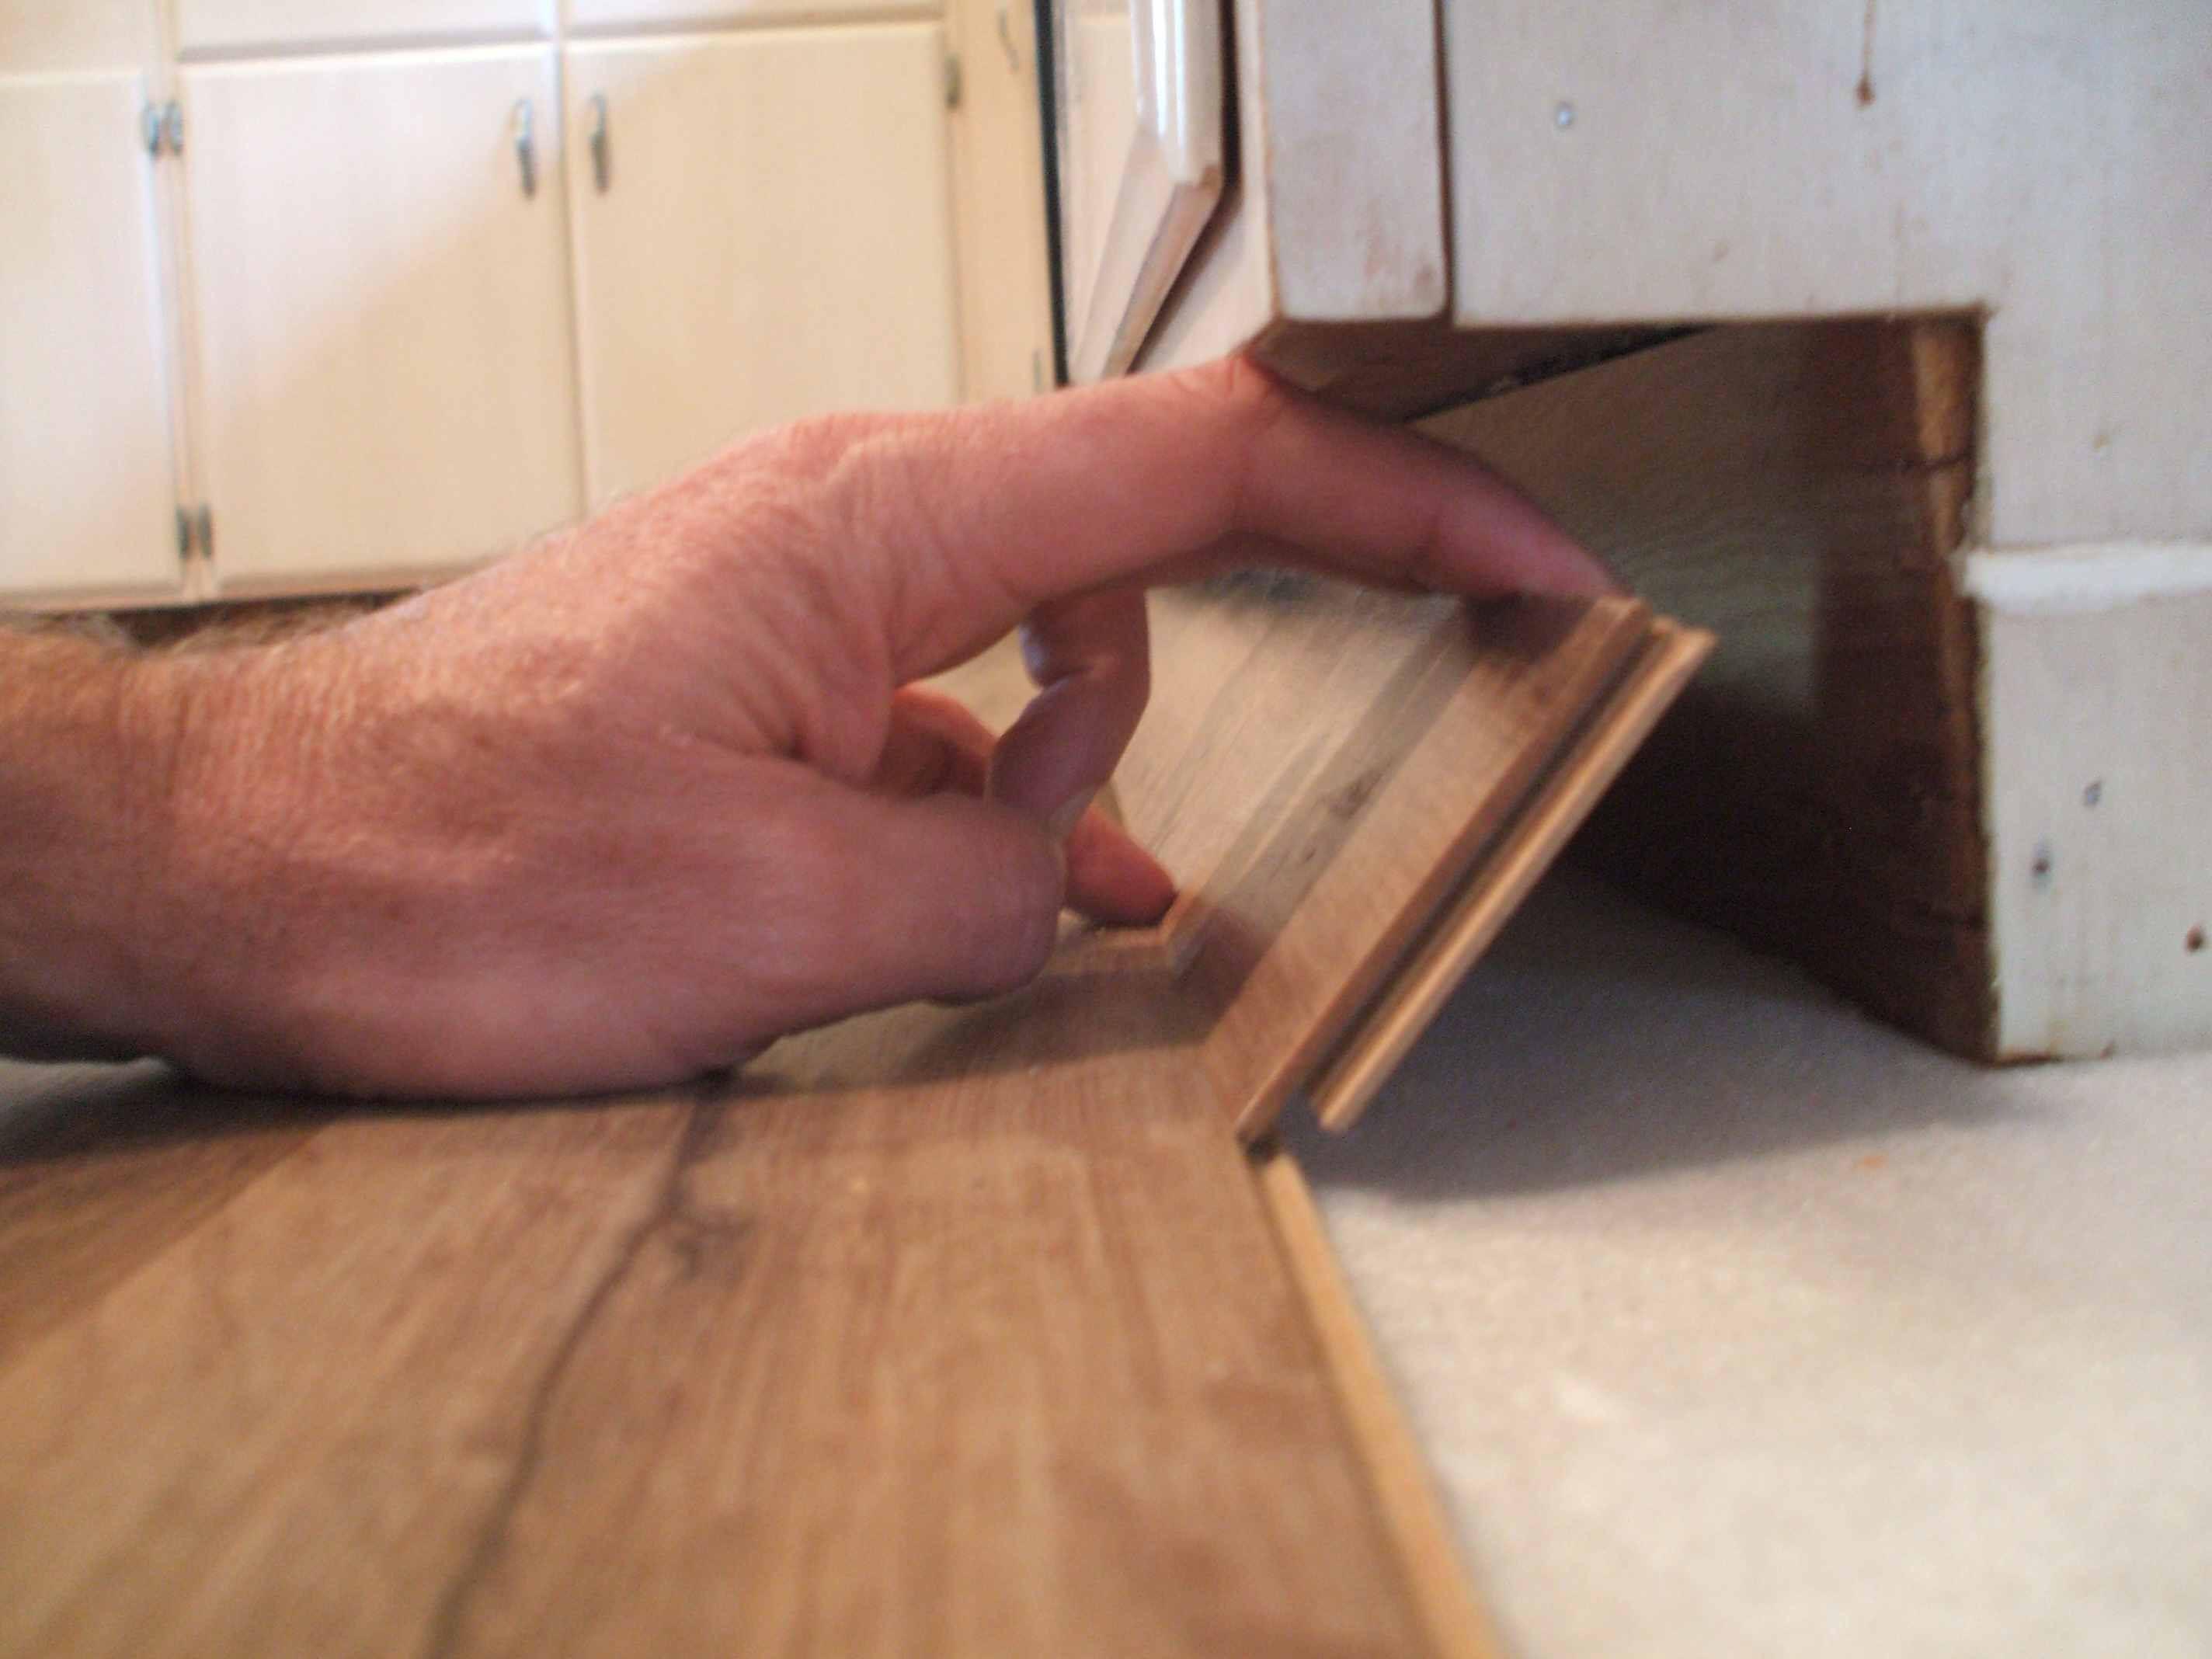 diy hardwood floor installation video of laminate flooring installation made easy intended for installing laminate laying last row 56a49e435f9b58b7d0d7ddda jpg